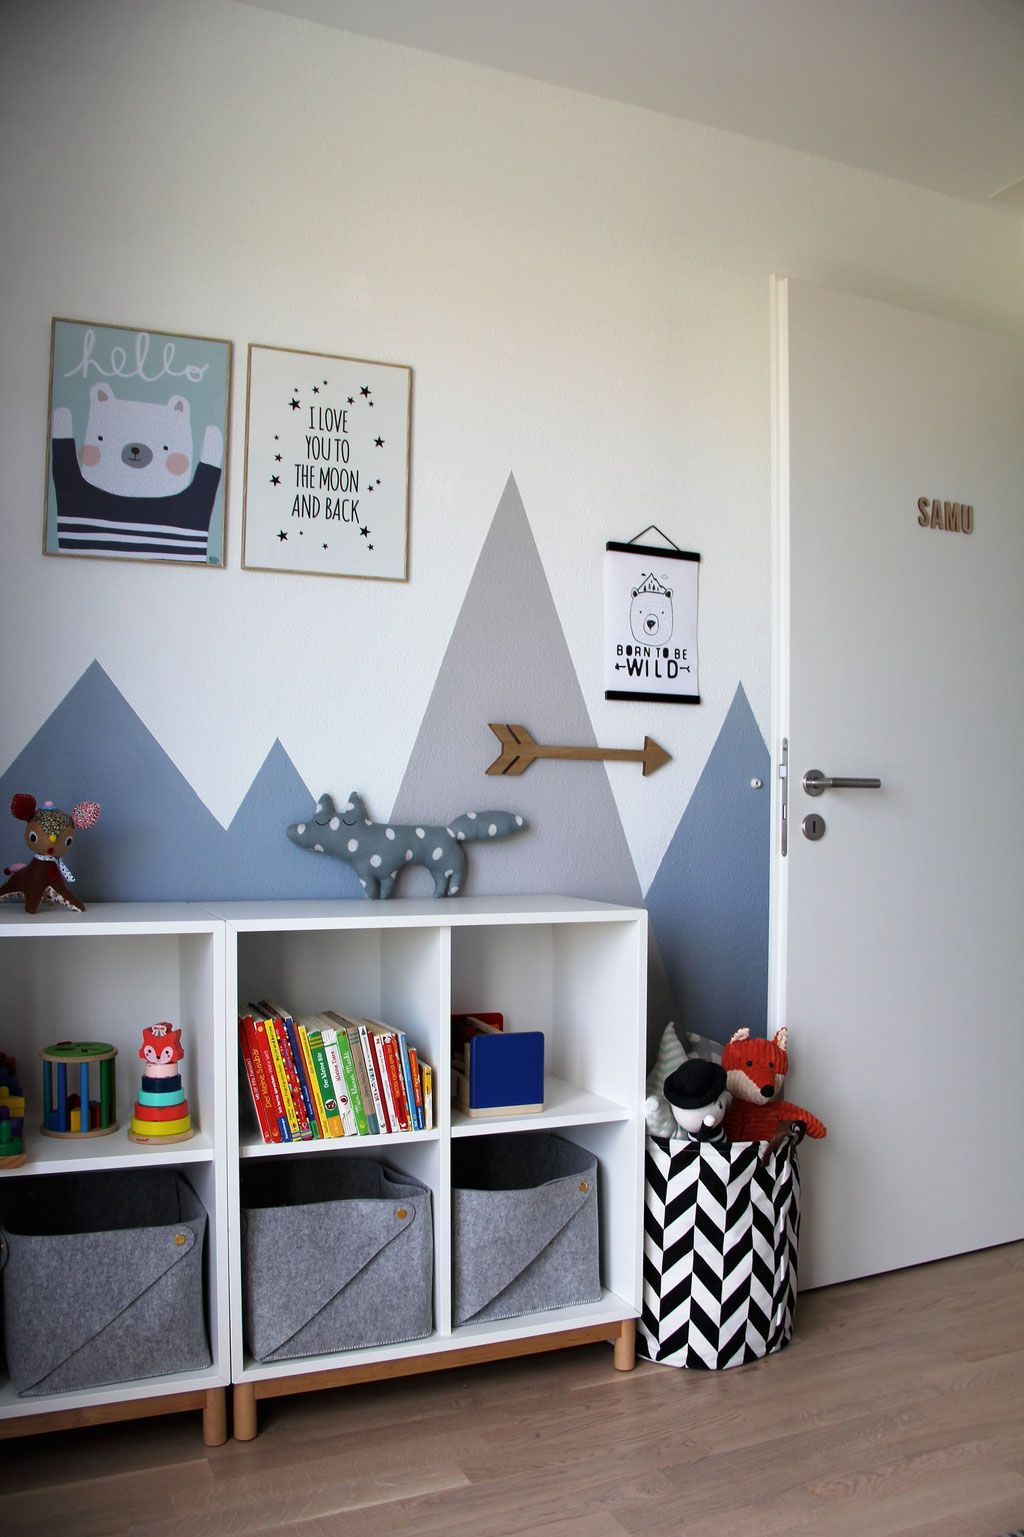 Babyzimmer Mint Grau Best Of Fotografie Kinderzimmer Inspiration nordic Berge Blau Grau Mint #modernekinderzimmer